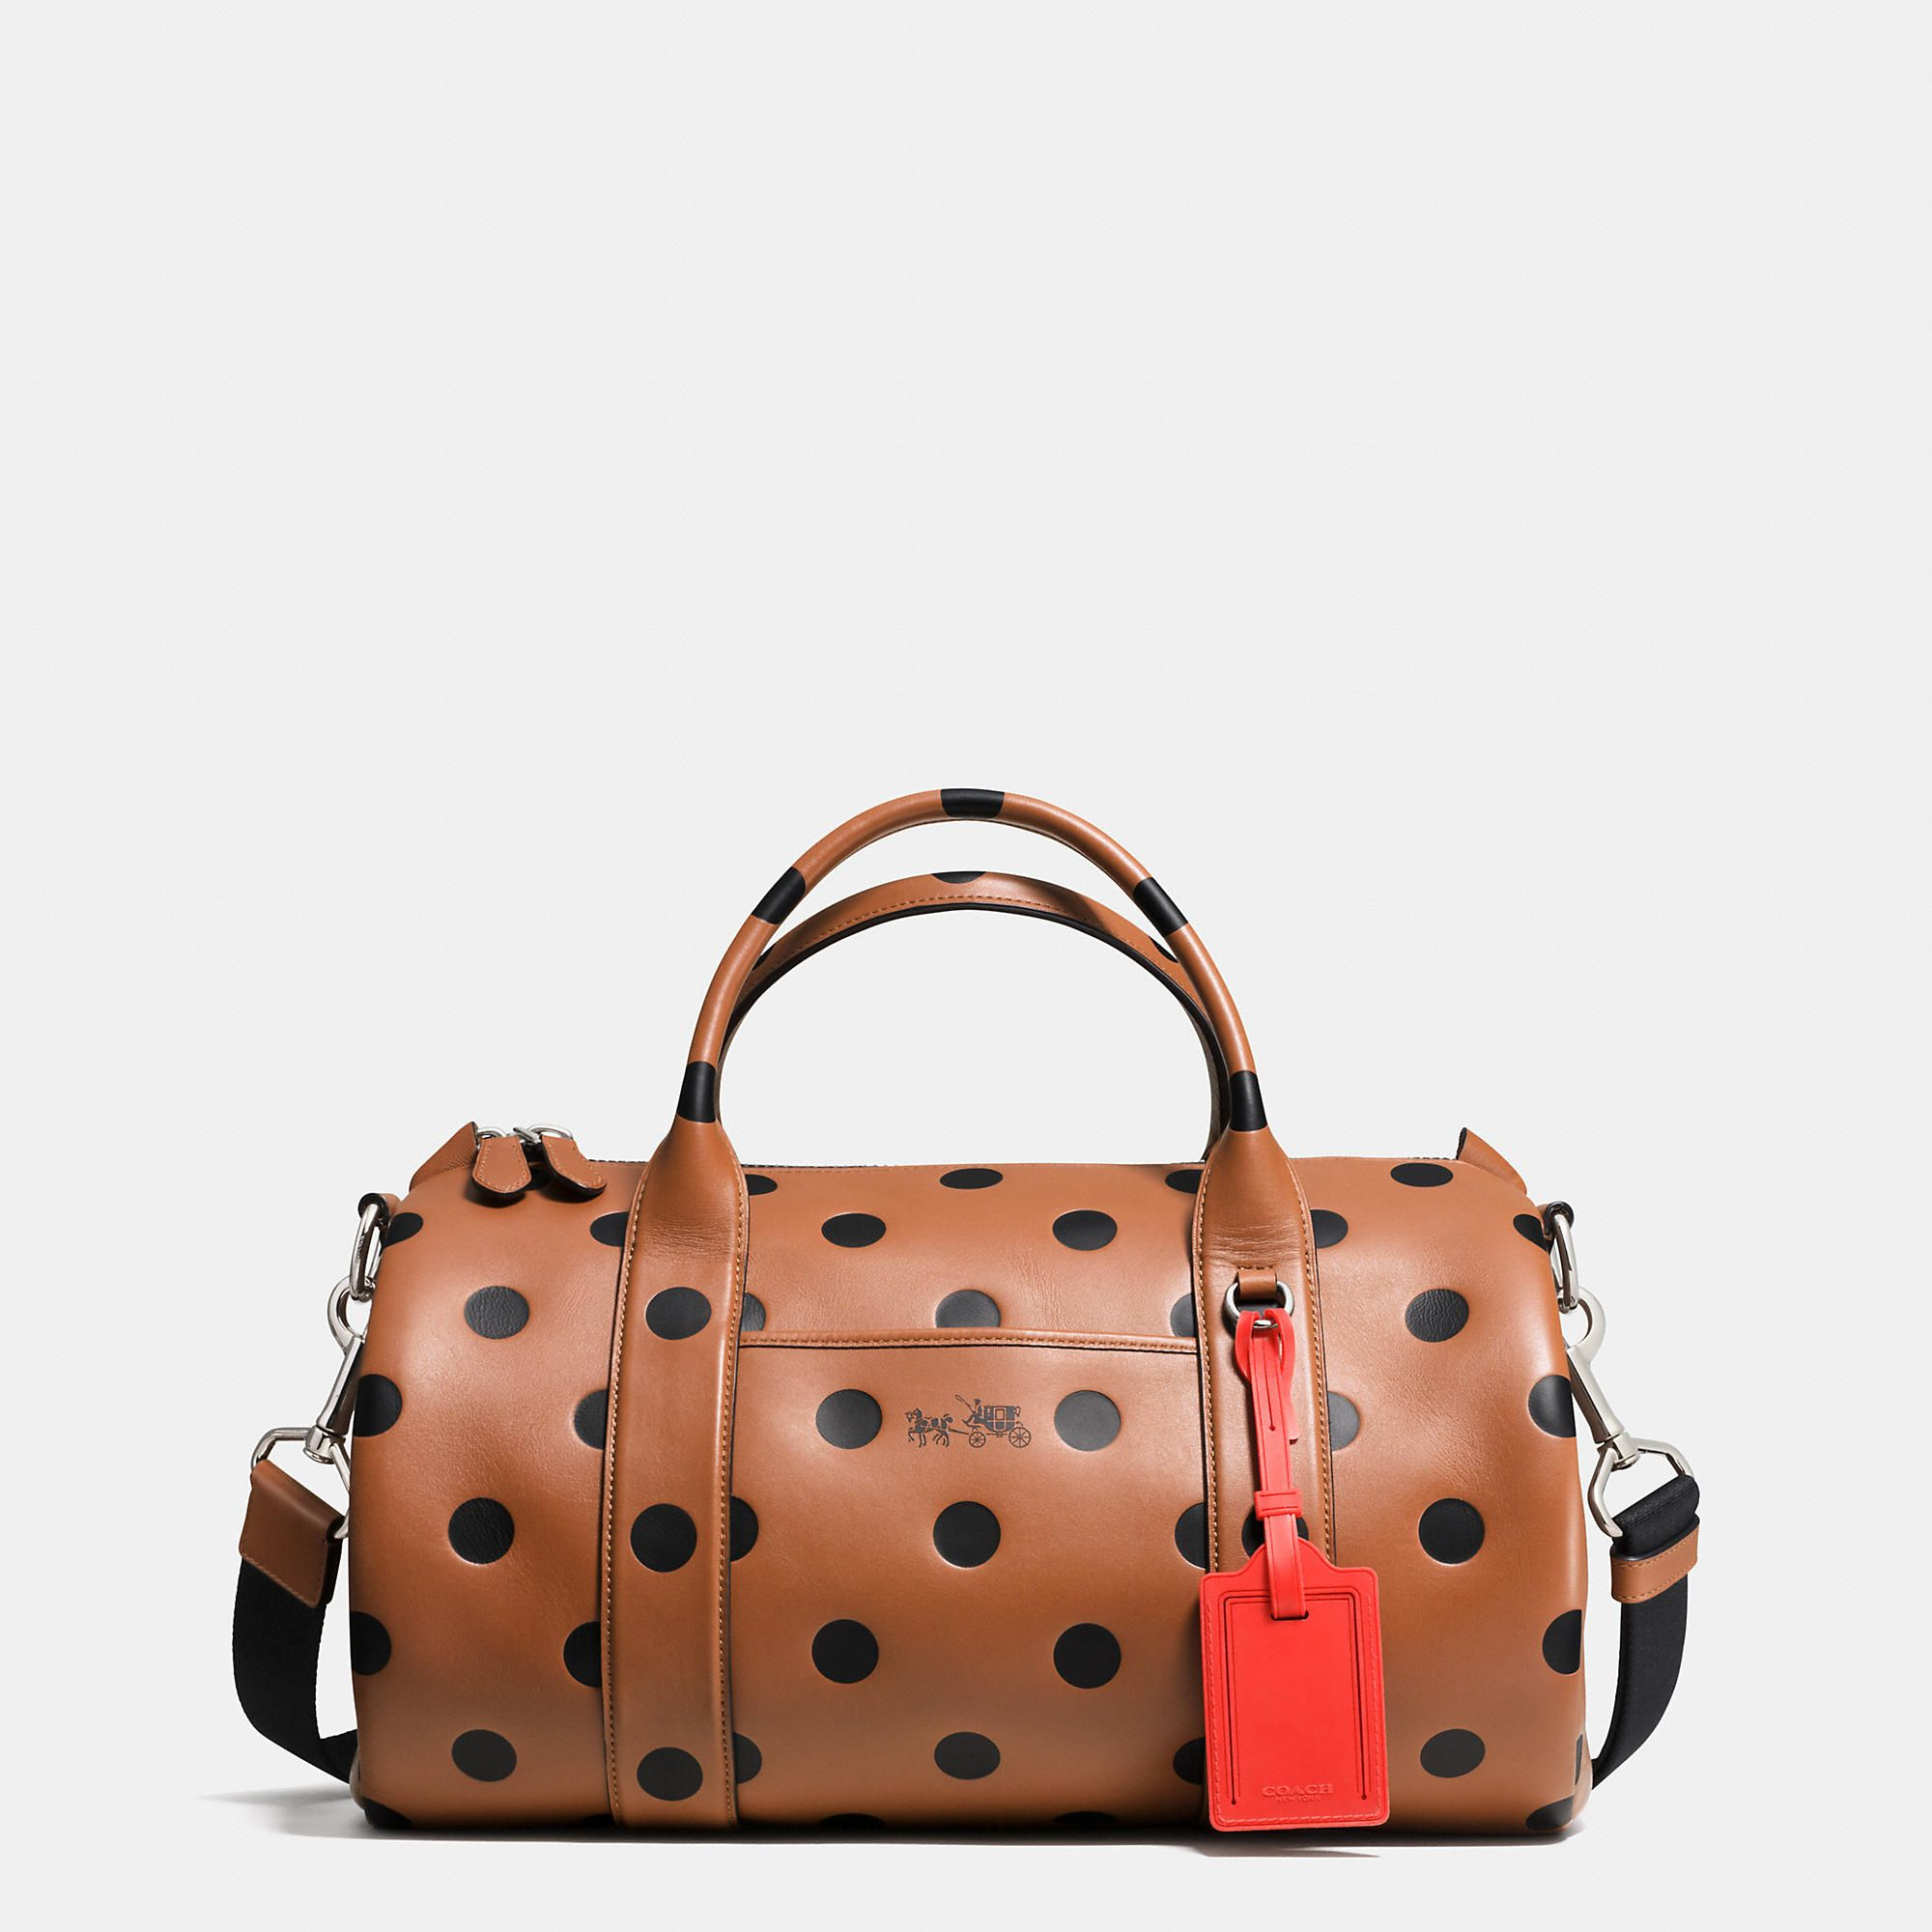 91e4cab9b COACH Designer Handbags | Small Barrel Bag In Saddle Dot Leather ...